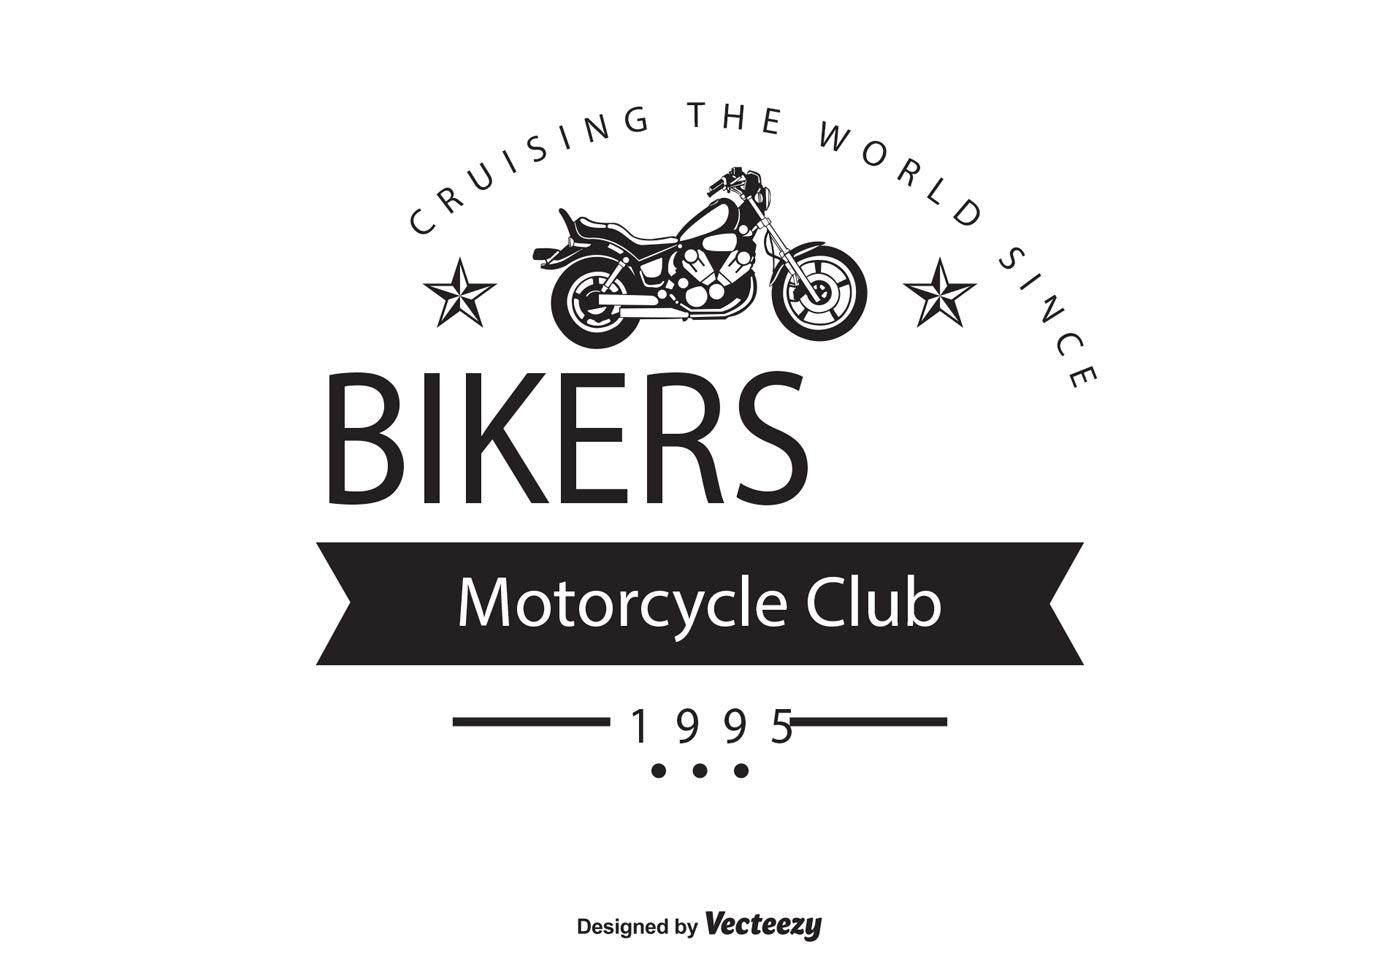 Bikers club logo template download free vector art stock graphics